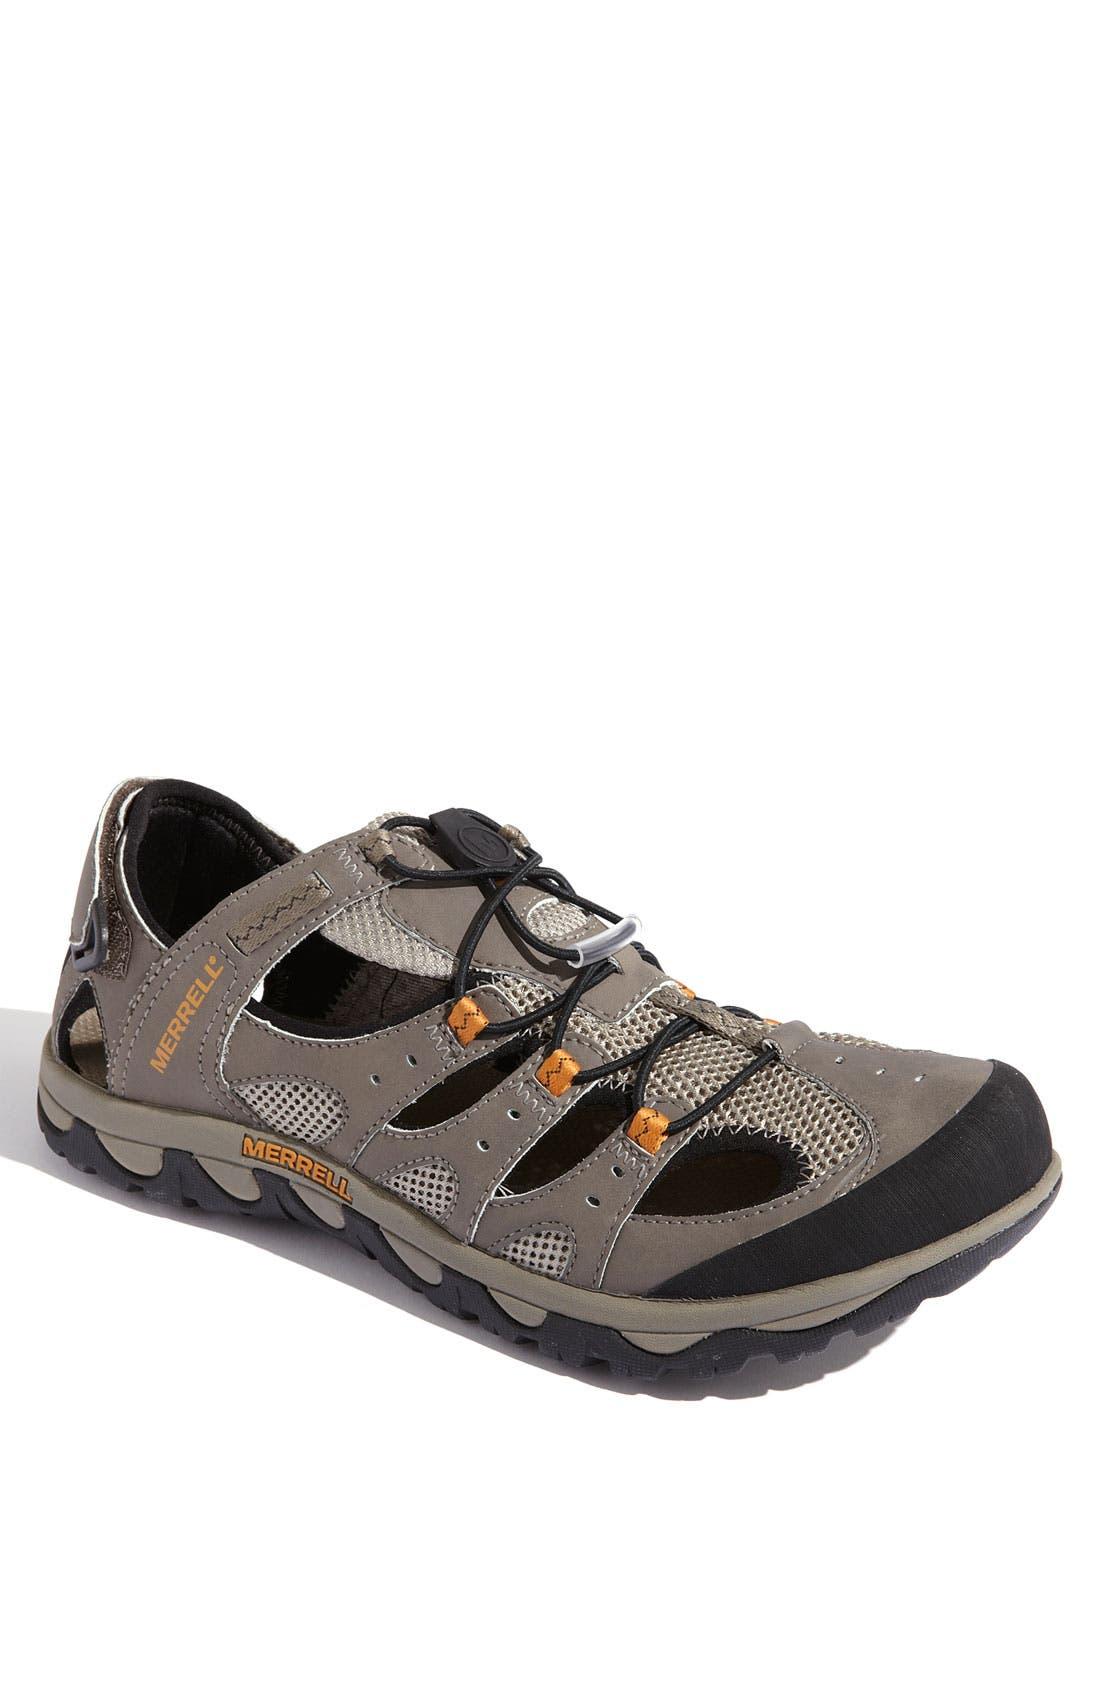 Main Image - Merrell 'Portage Web' Water Shoe (Men)